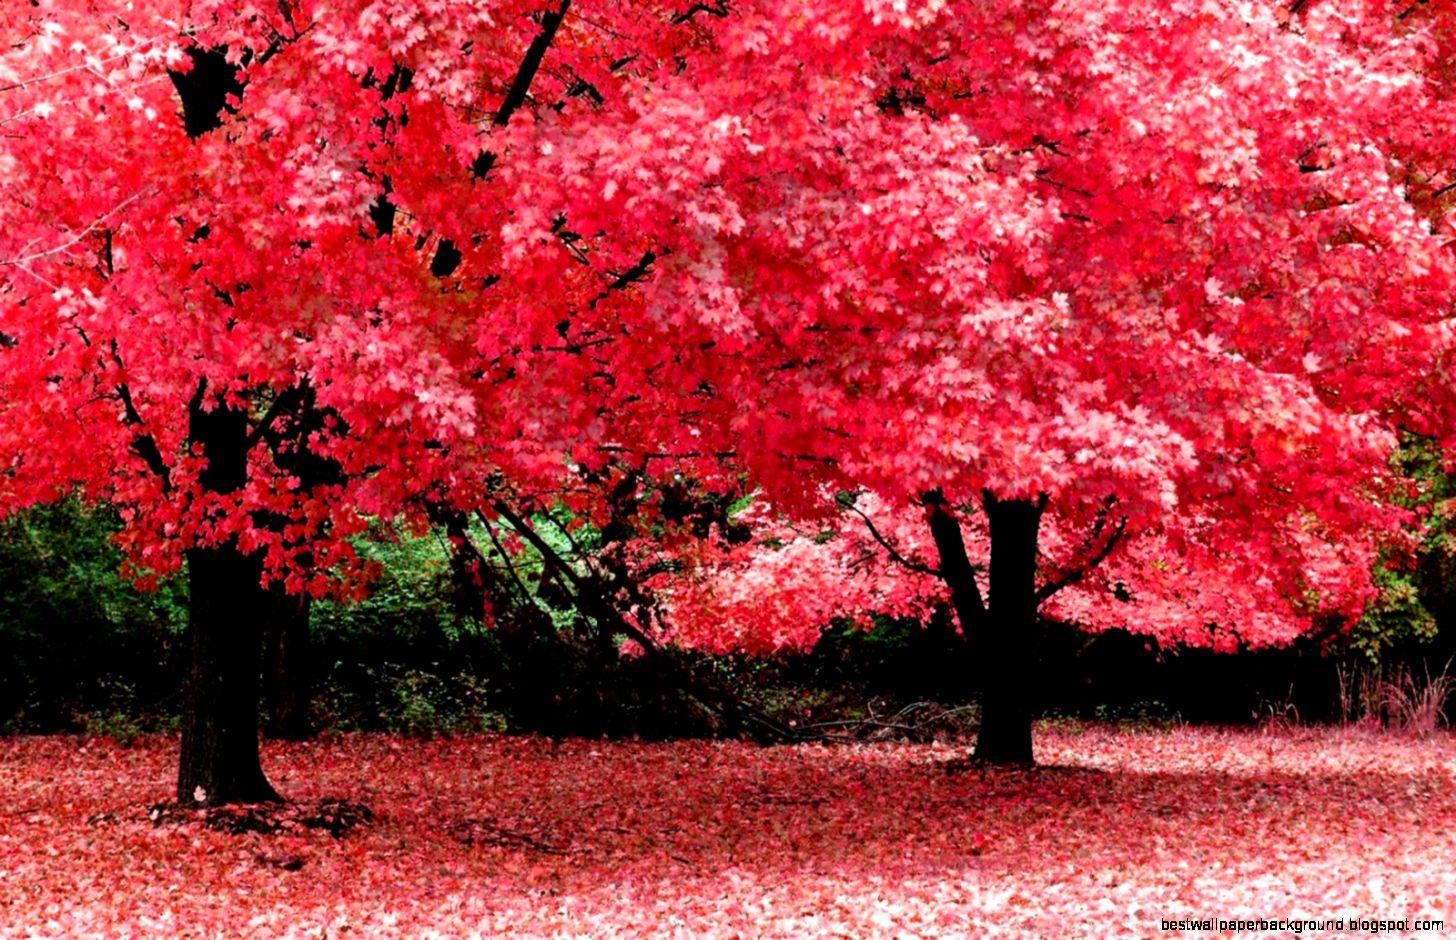 Nature Spring Wallpapers Desktop | Best Wallpaper Background